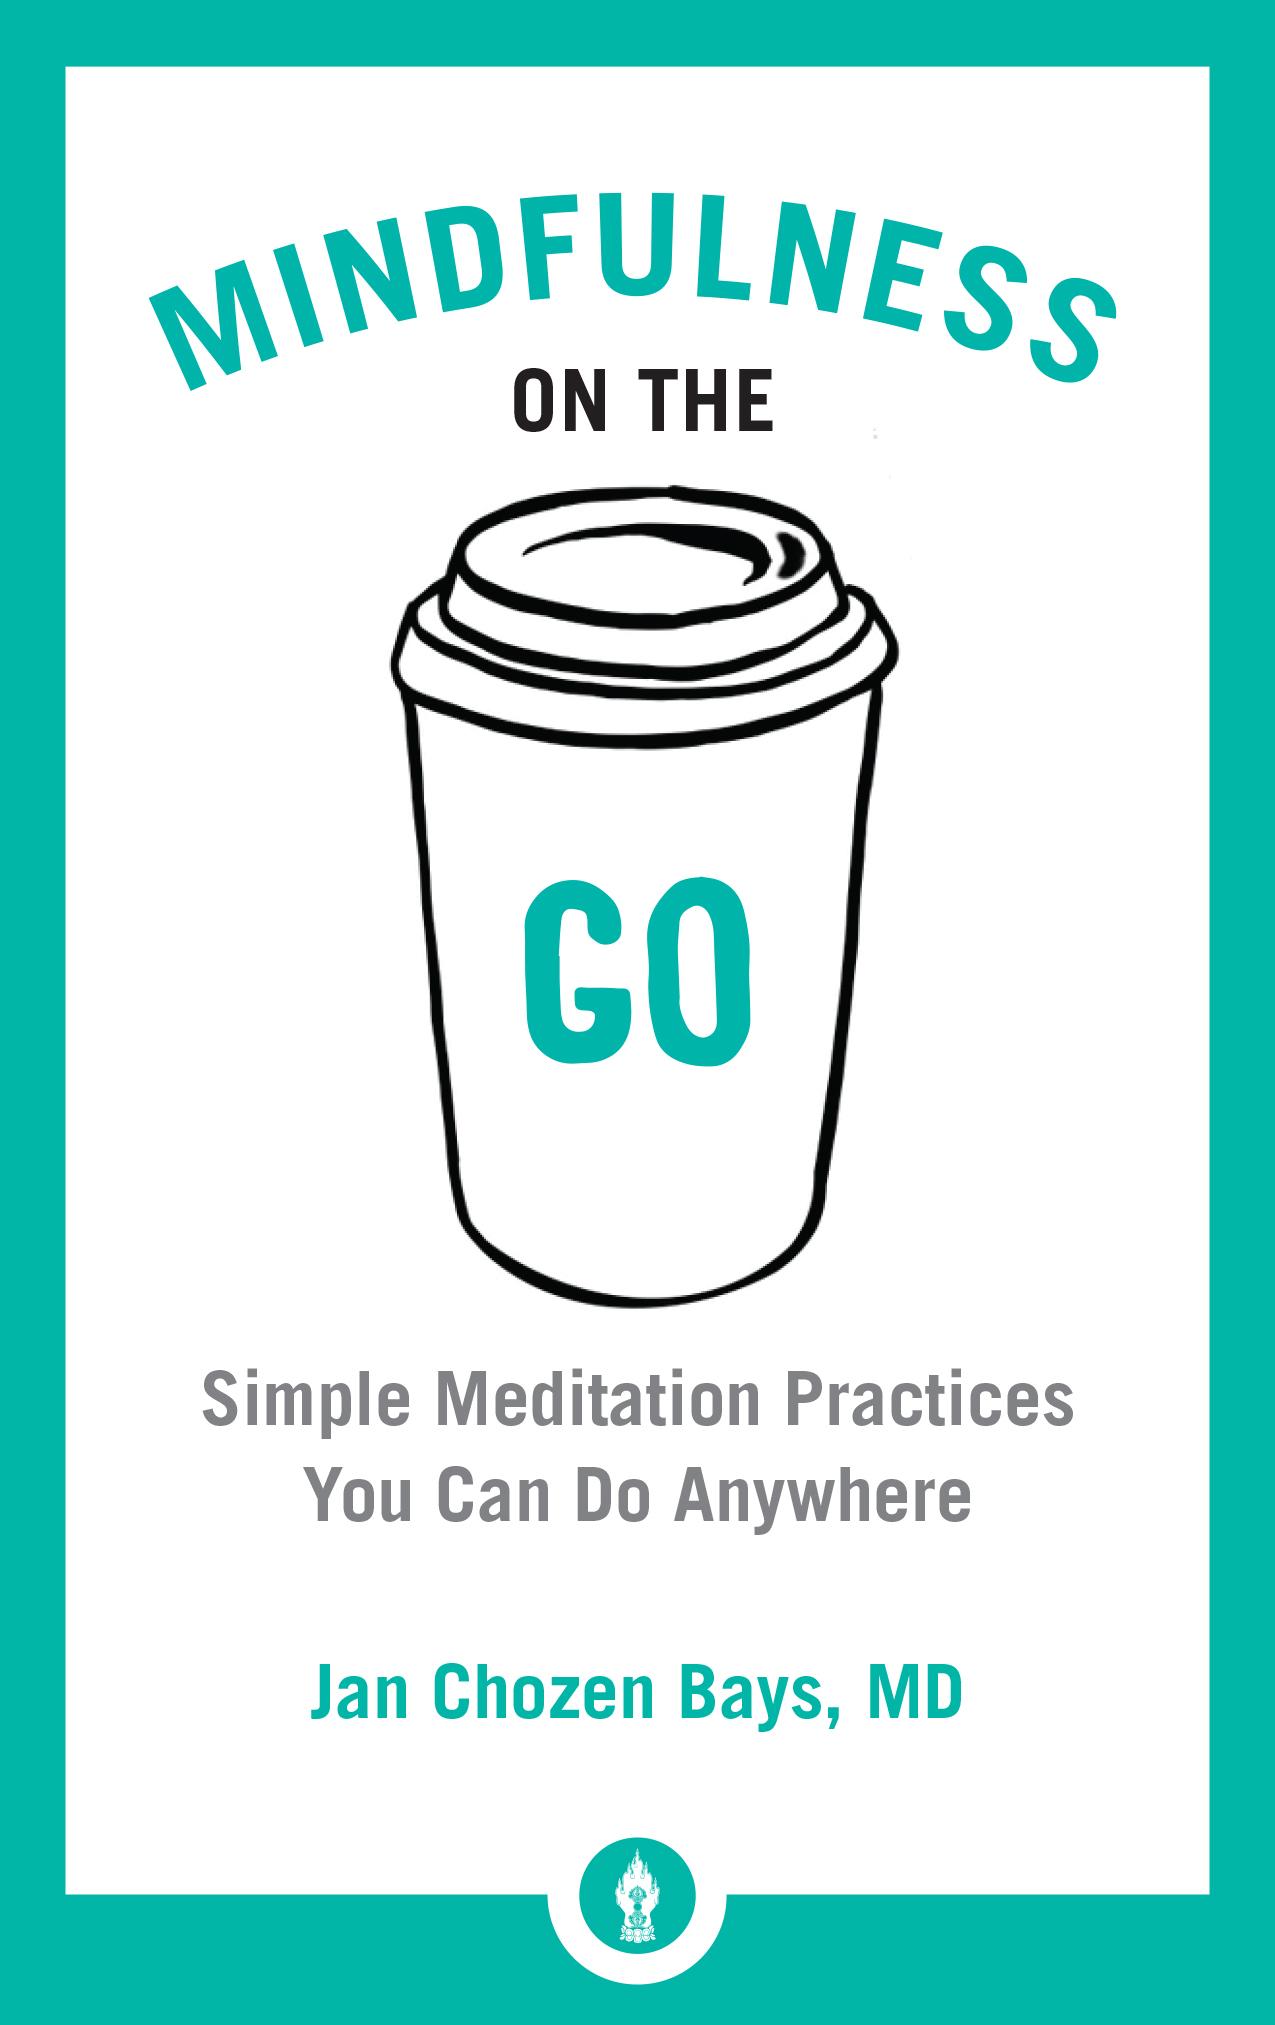 Pocket mindfulness on the go approved